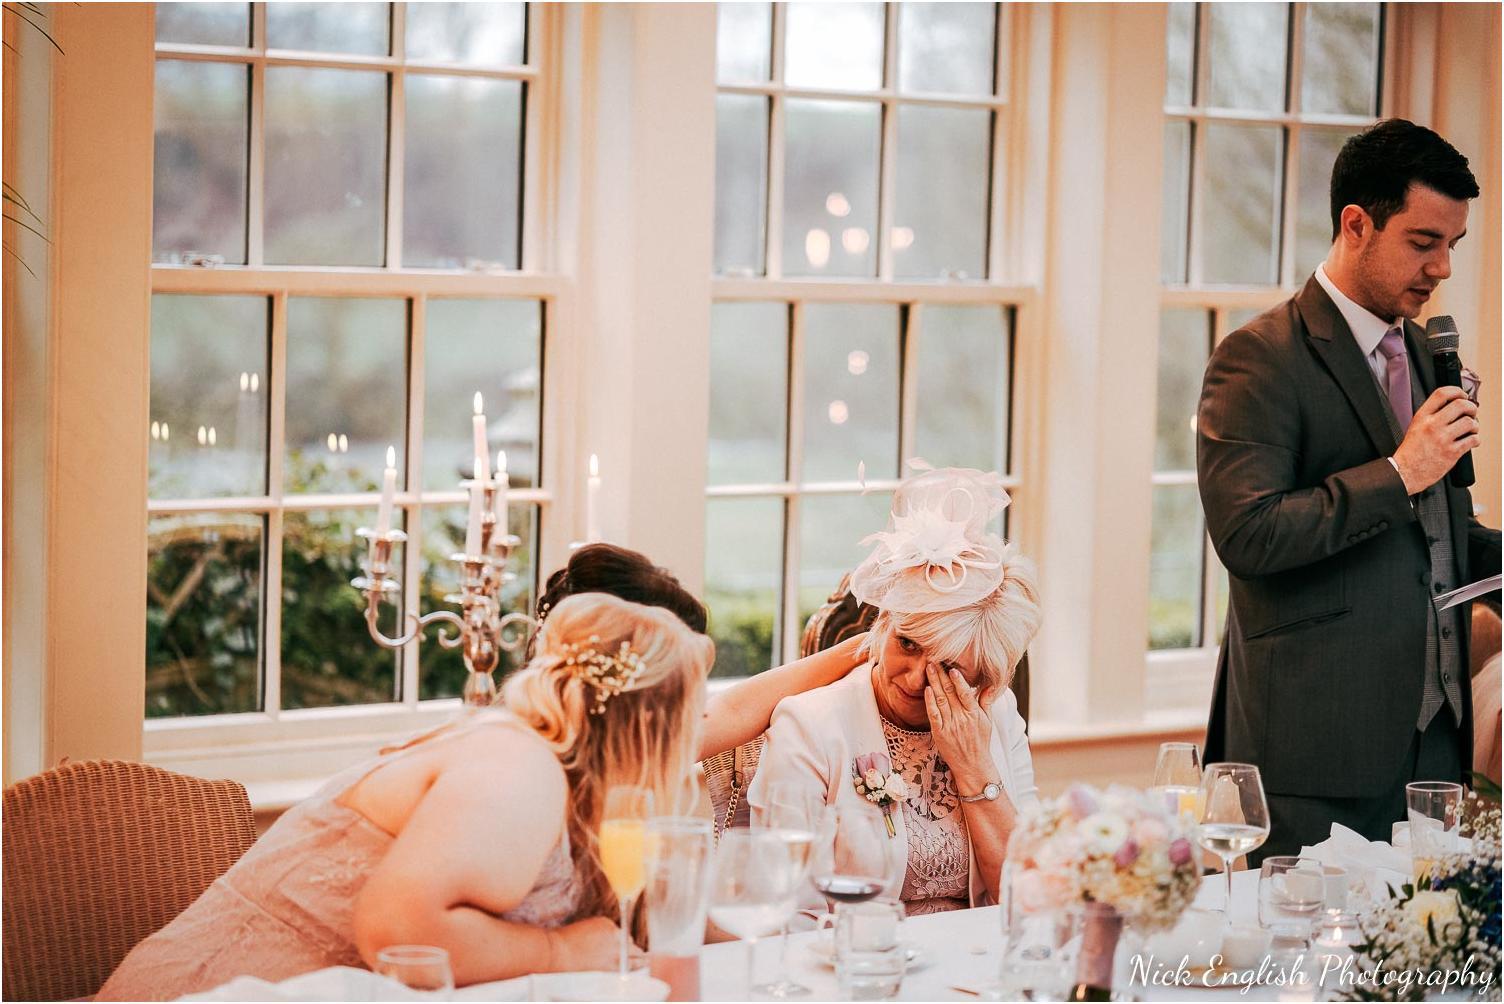 Mitton_Hall_Wedding_Photographer_2018-140.jpg